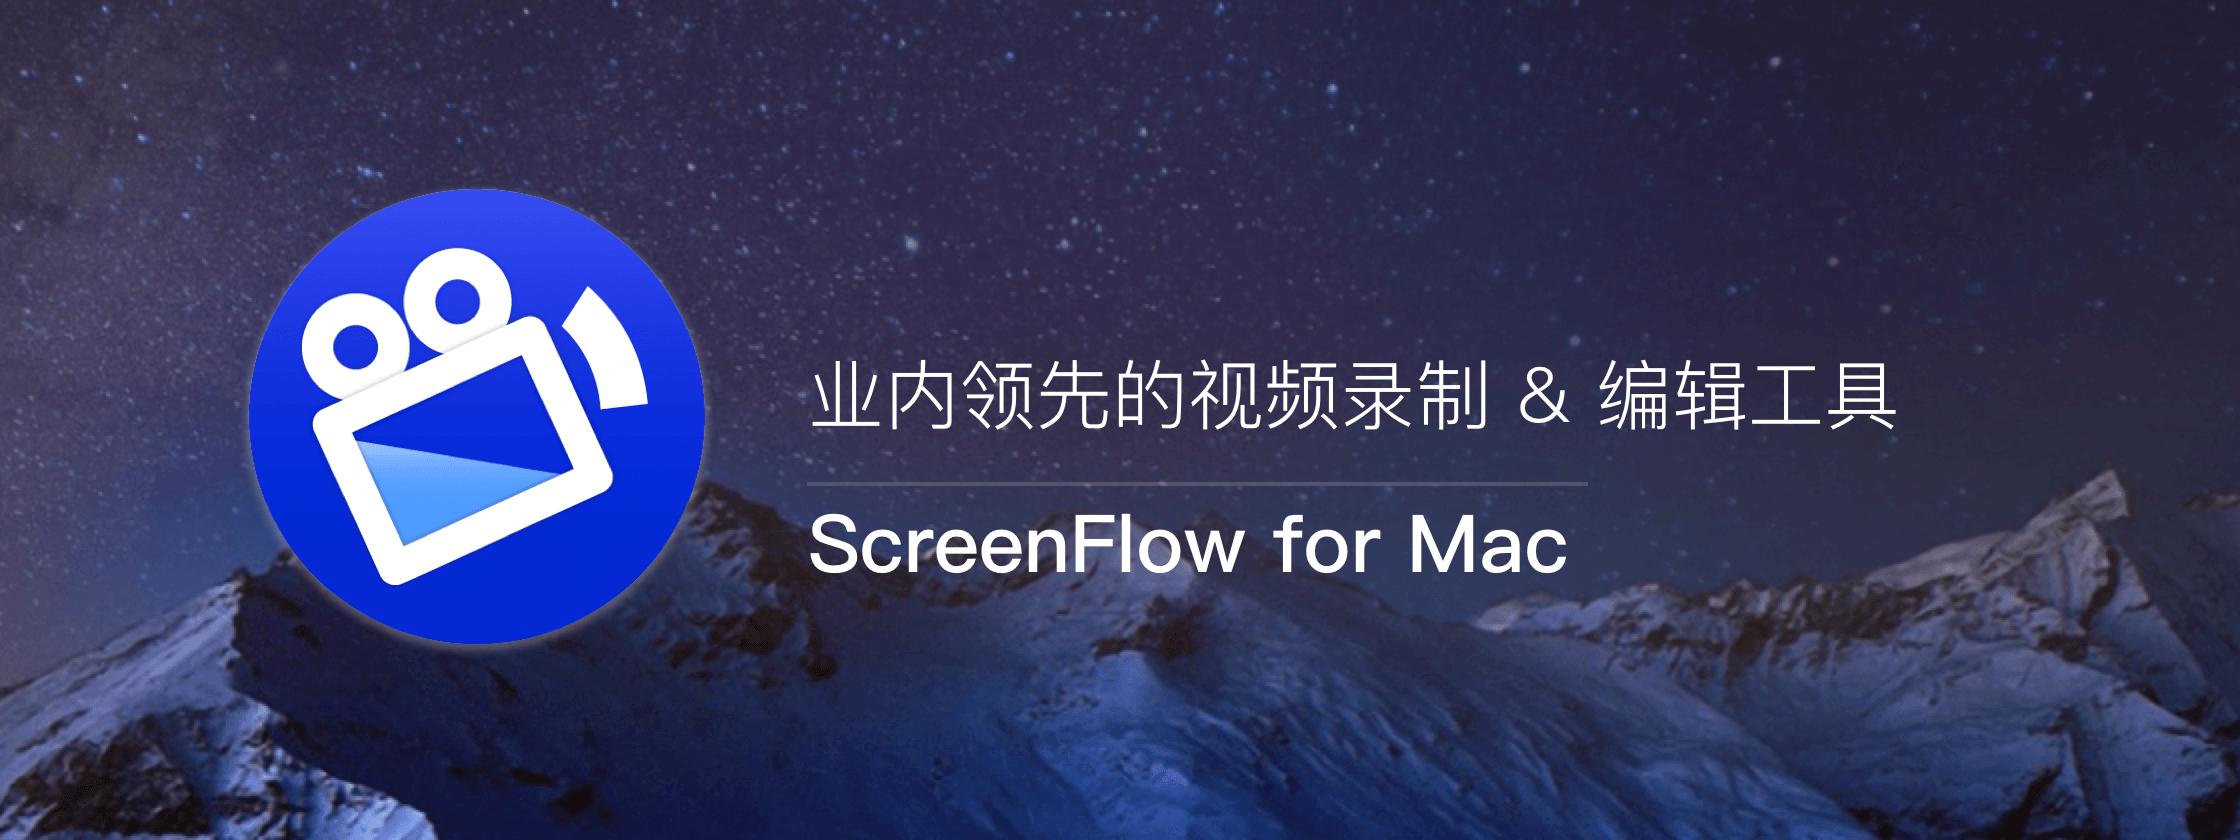 ScreenFlow for Mac – 业内领先的视频录制 & 编辑工具